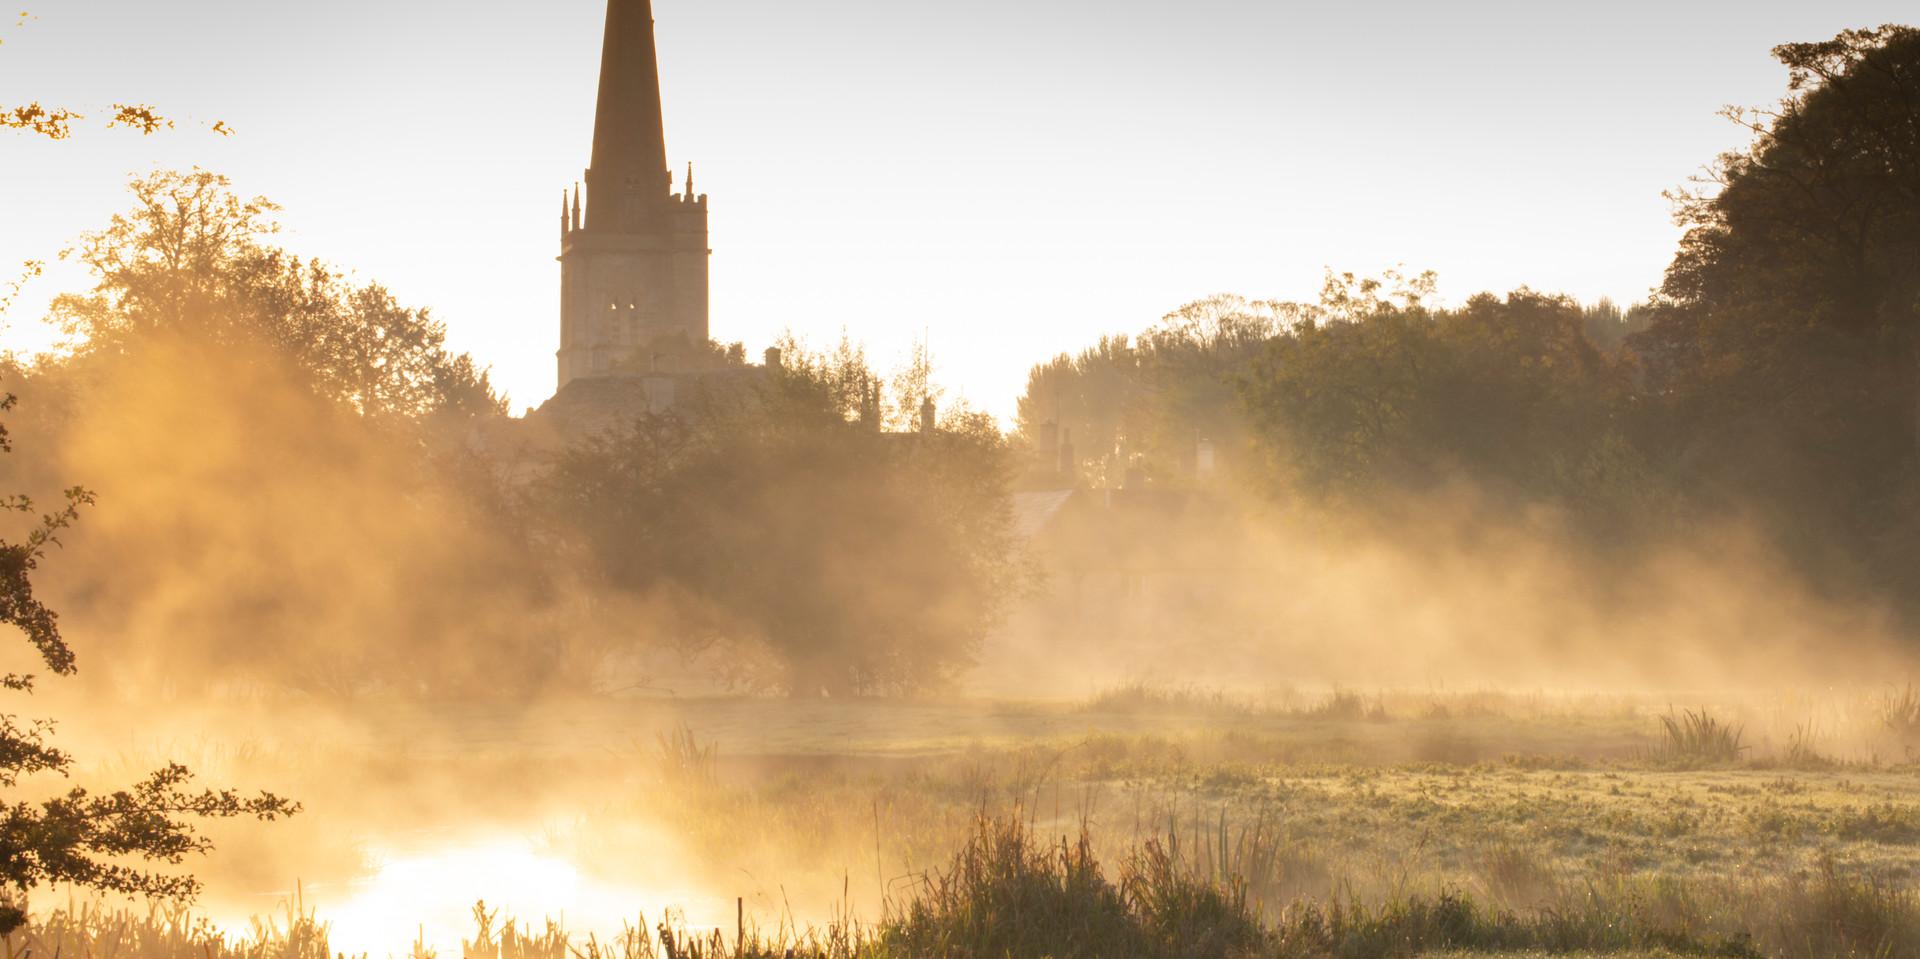 Burford-at-sunrise-Cotswolds-October_Wil